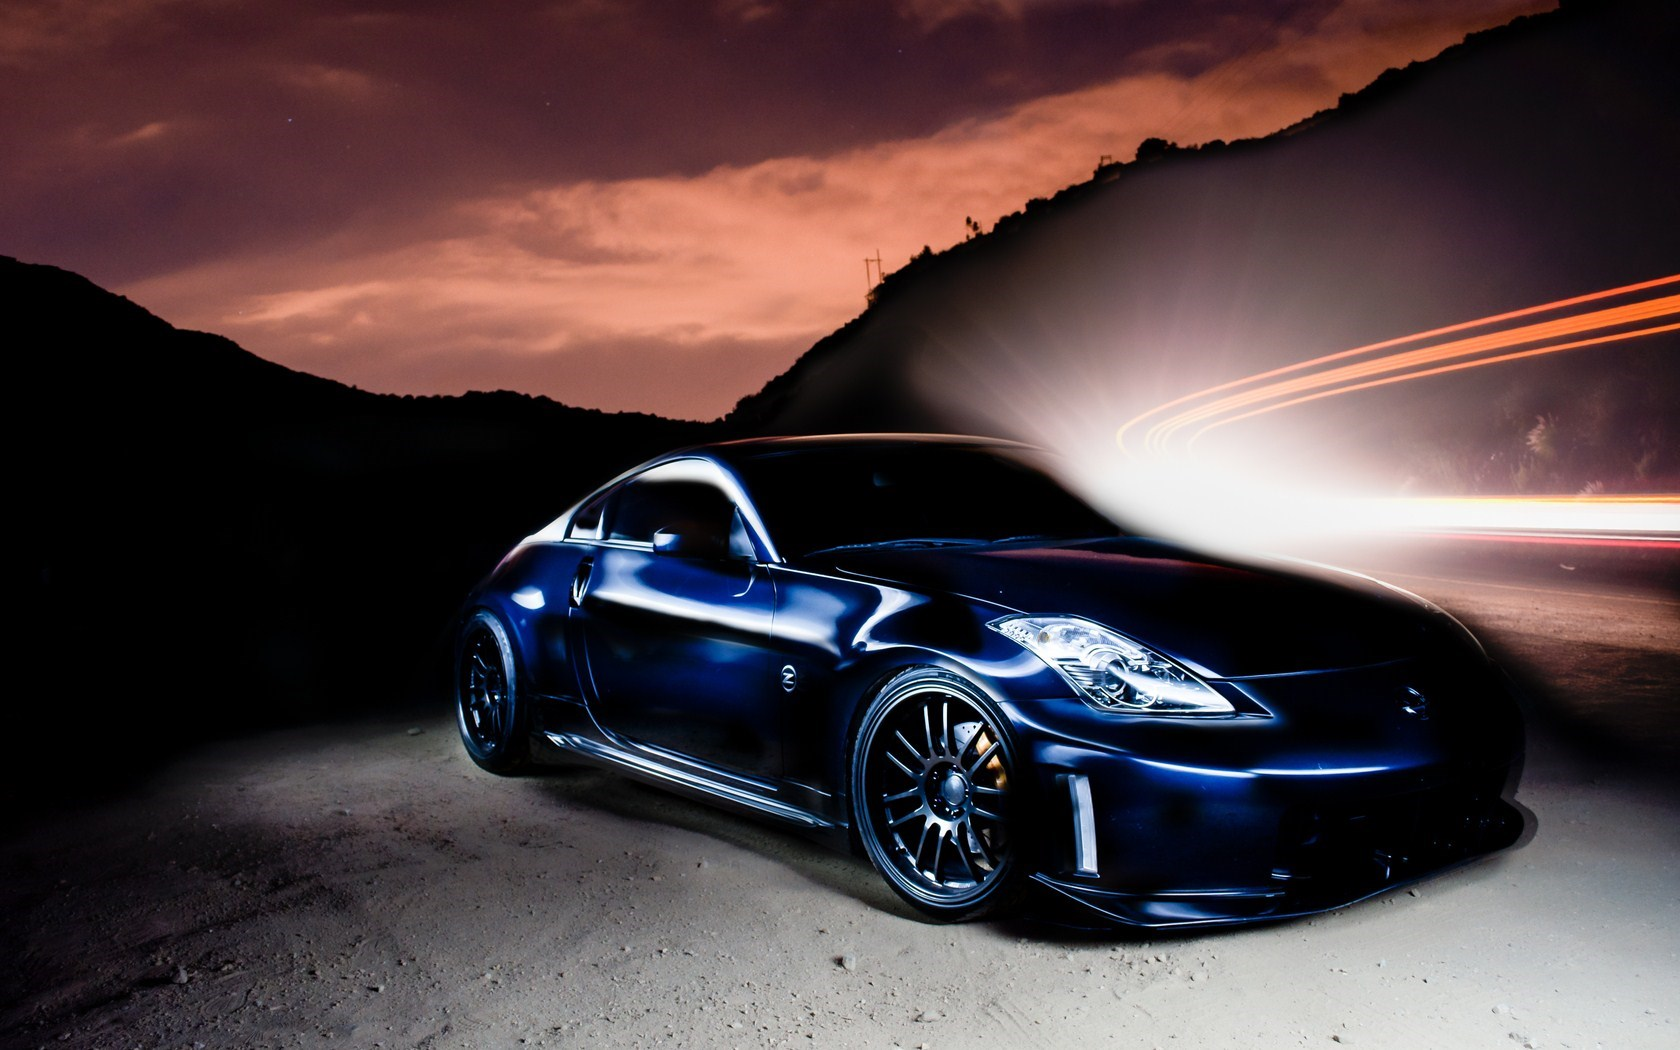 Nissan Car Tuning Lights